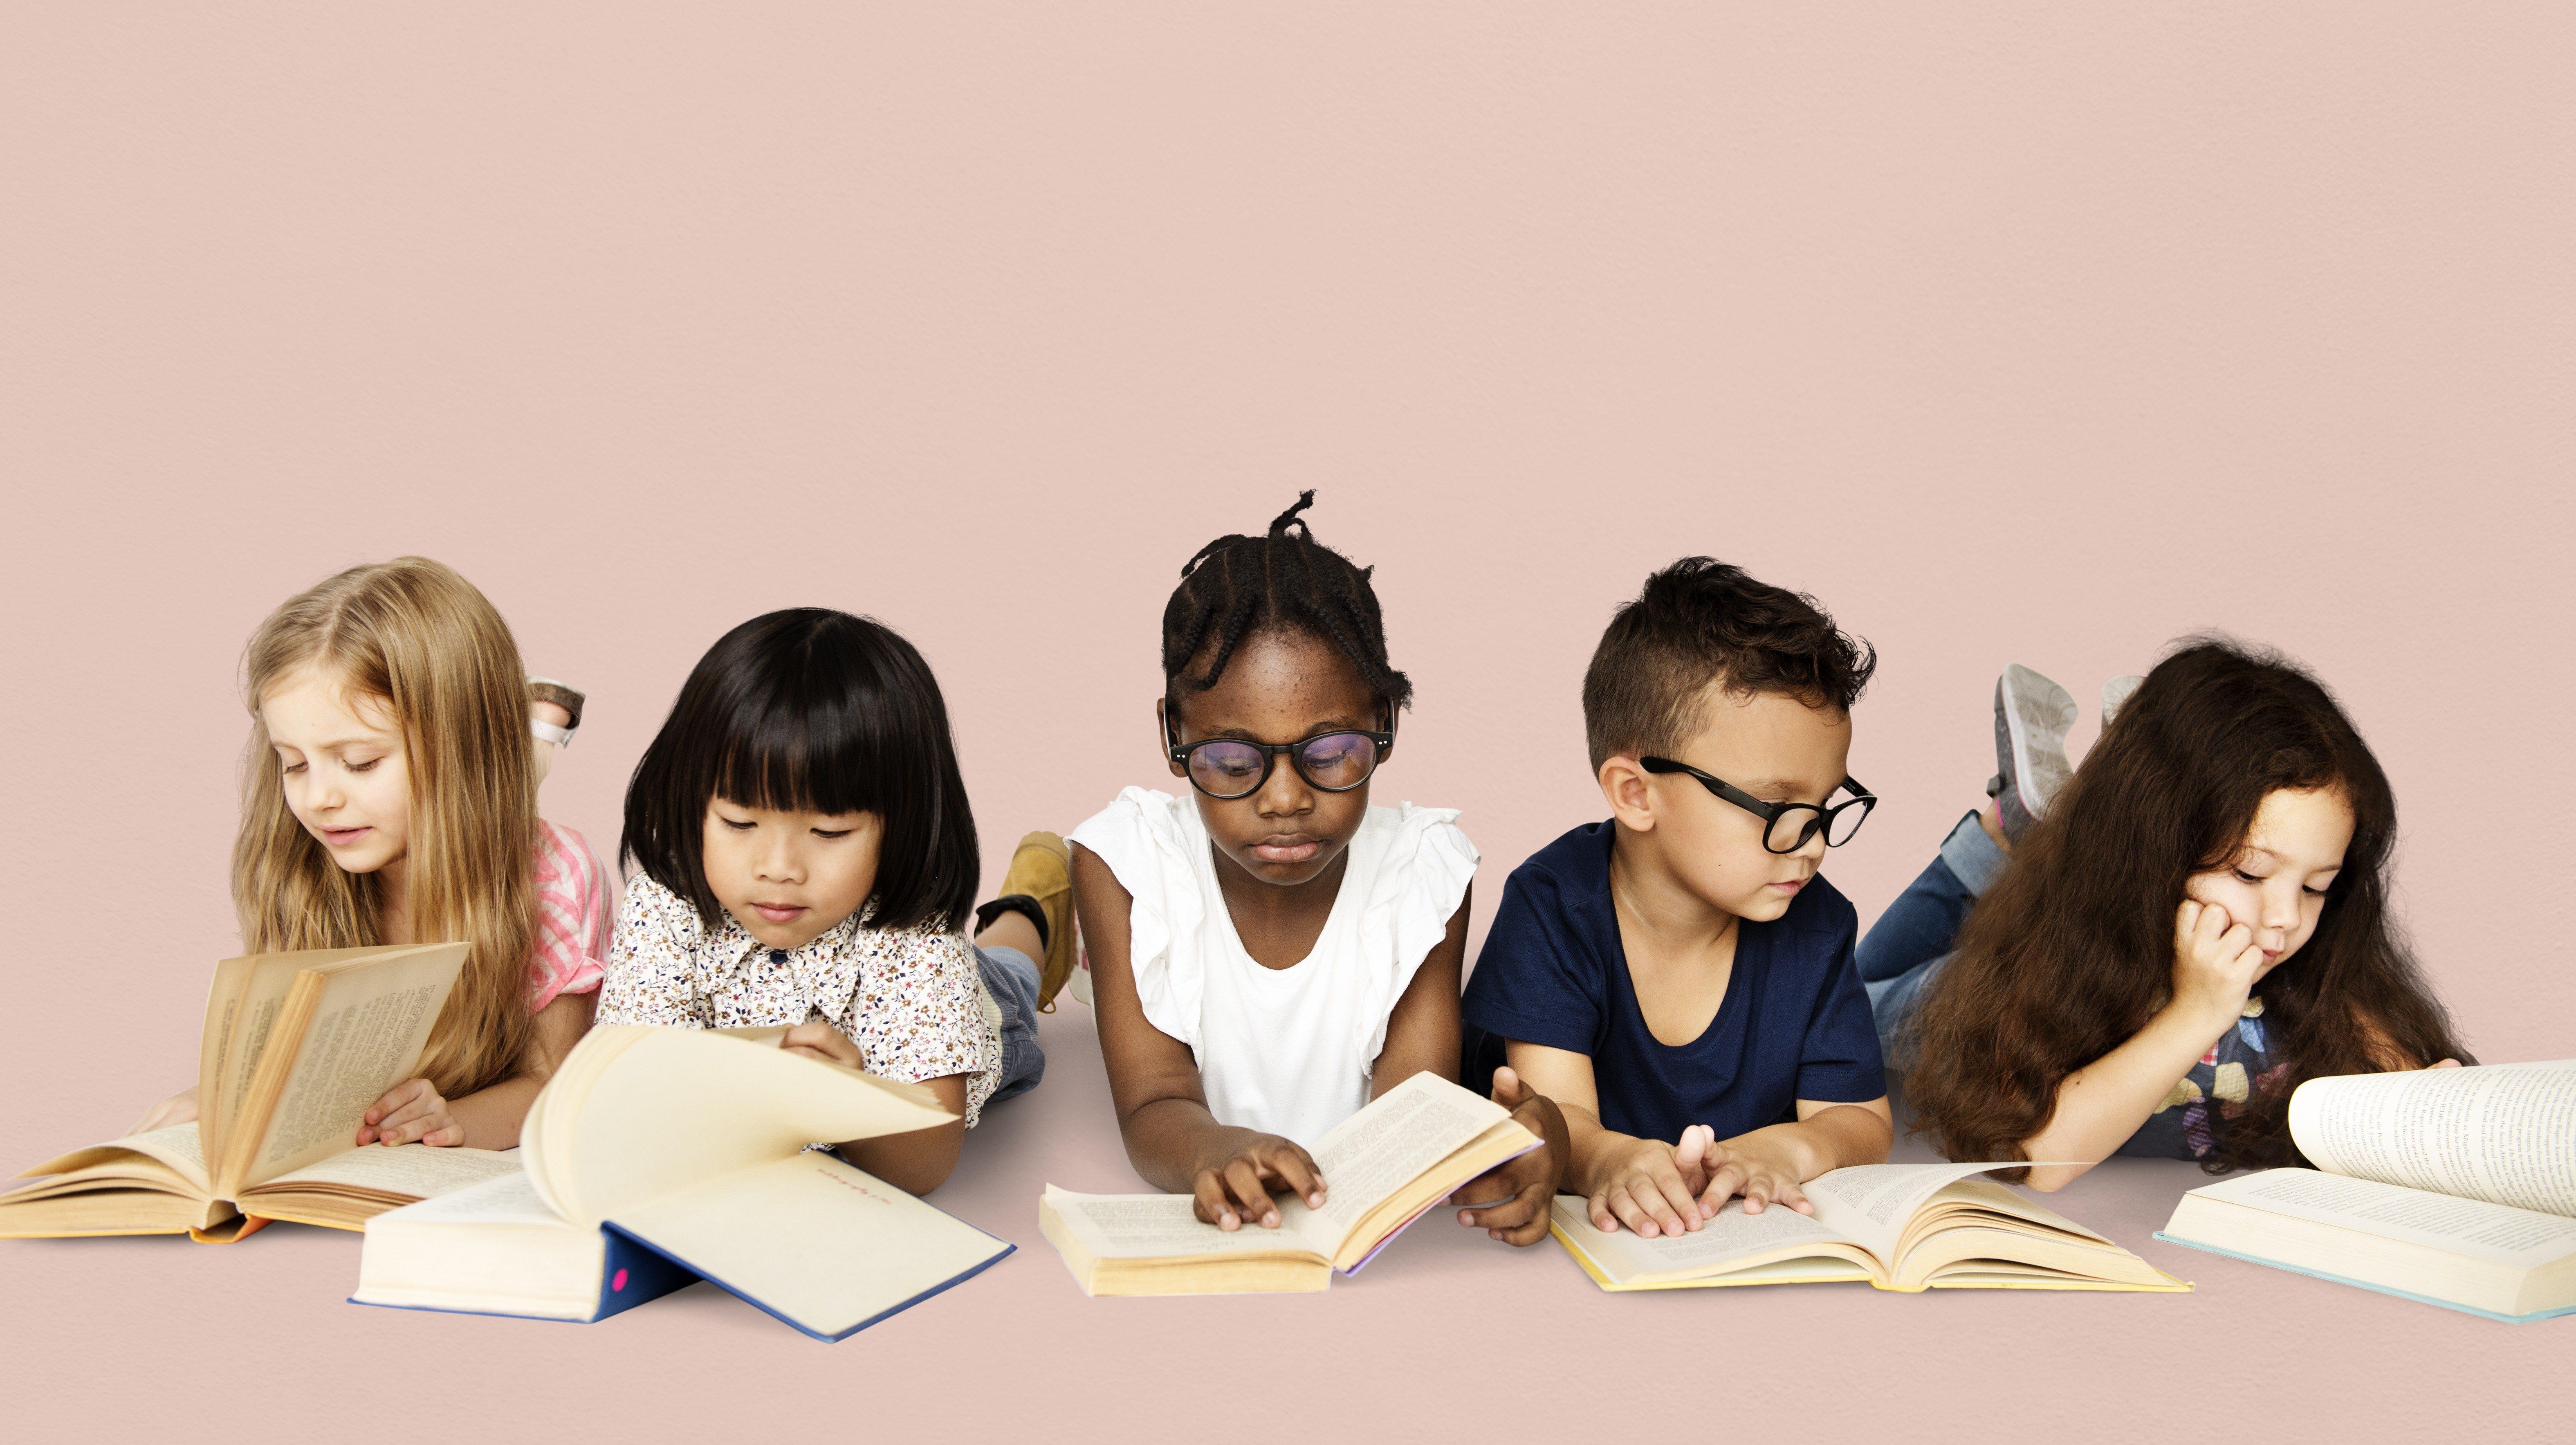 The 25 Best Children's Books Ever Written | Reader's Digest